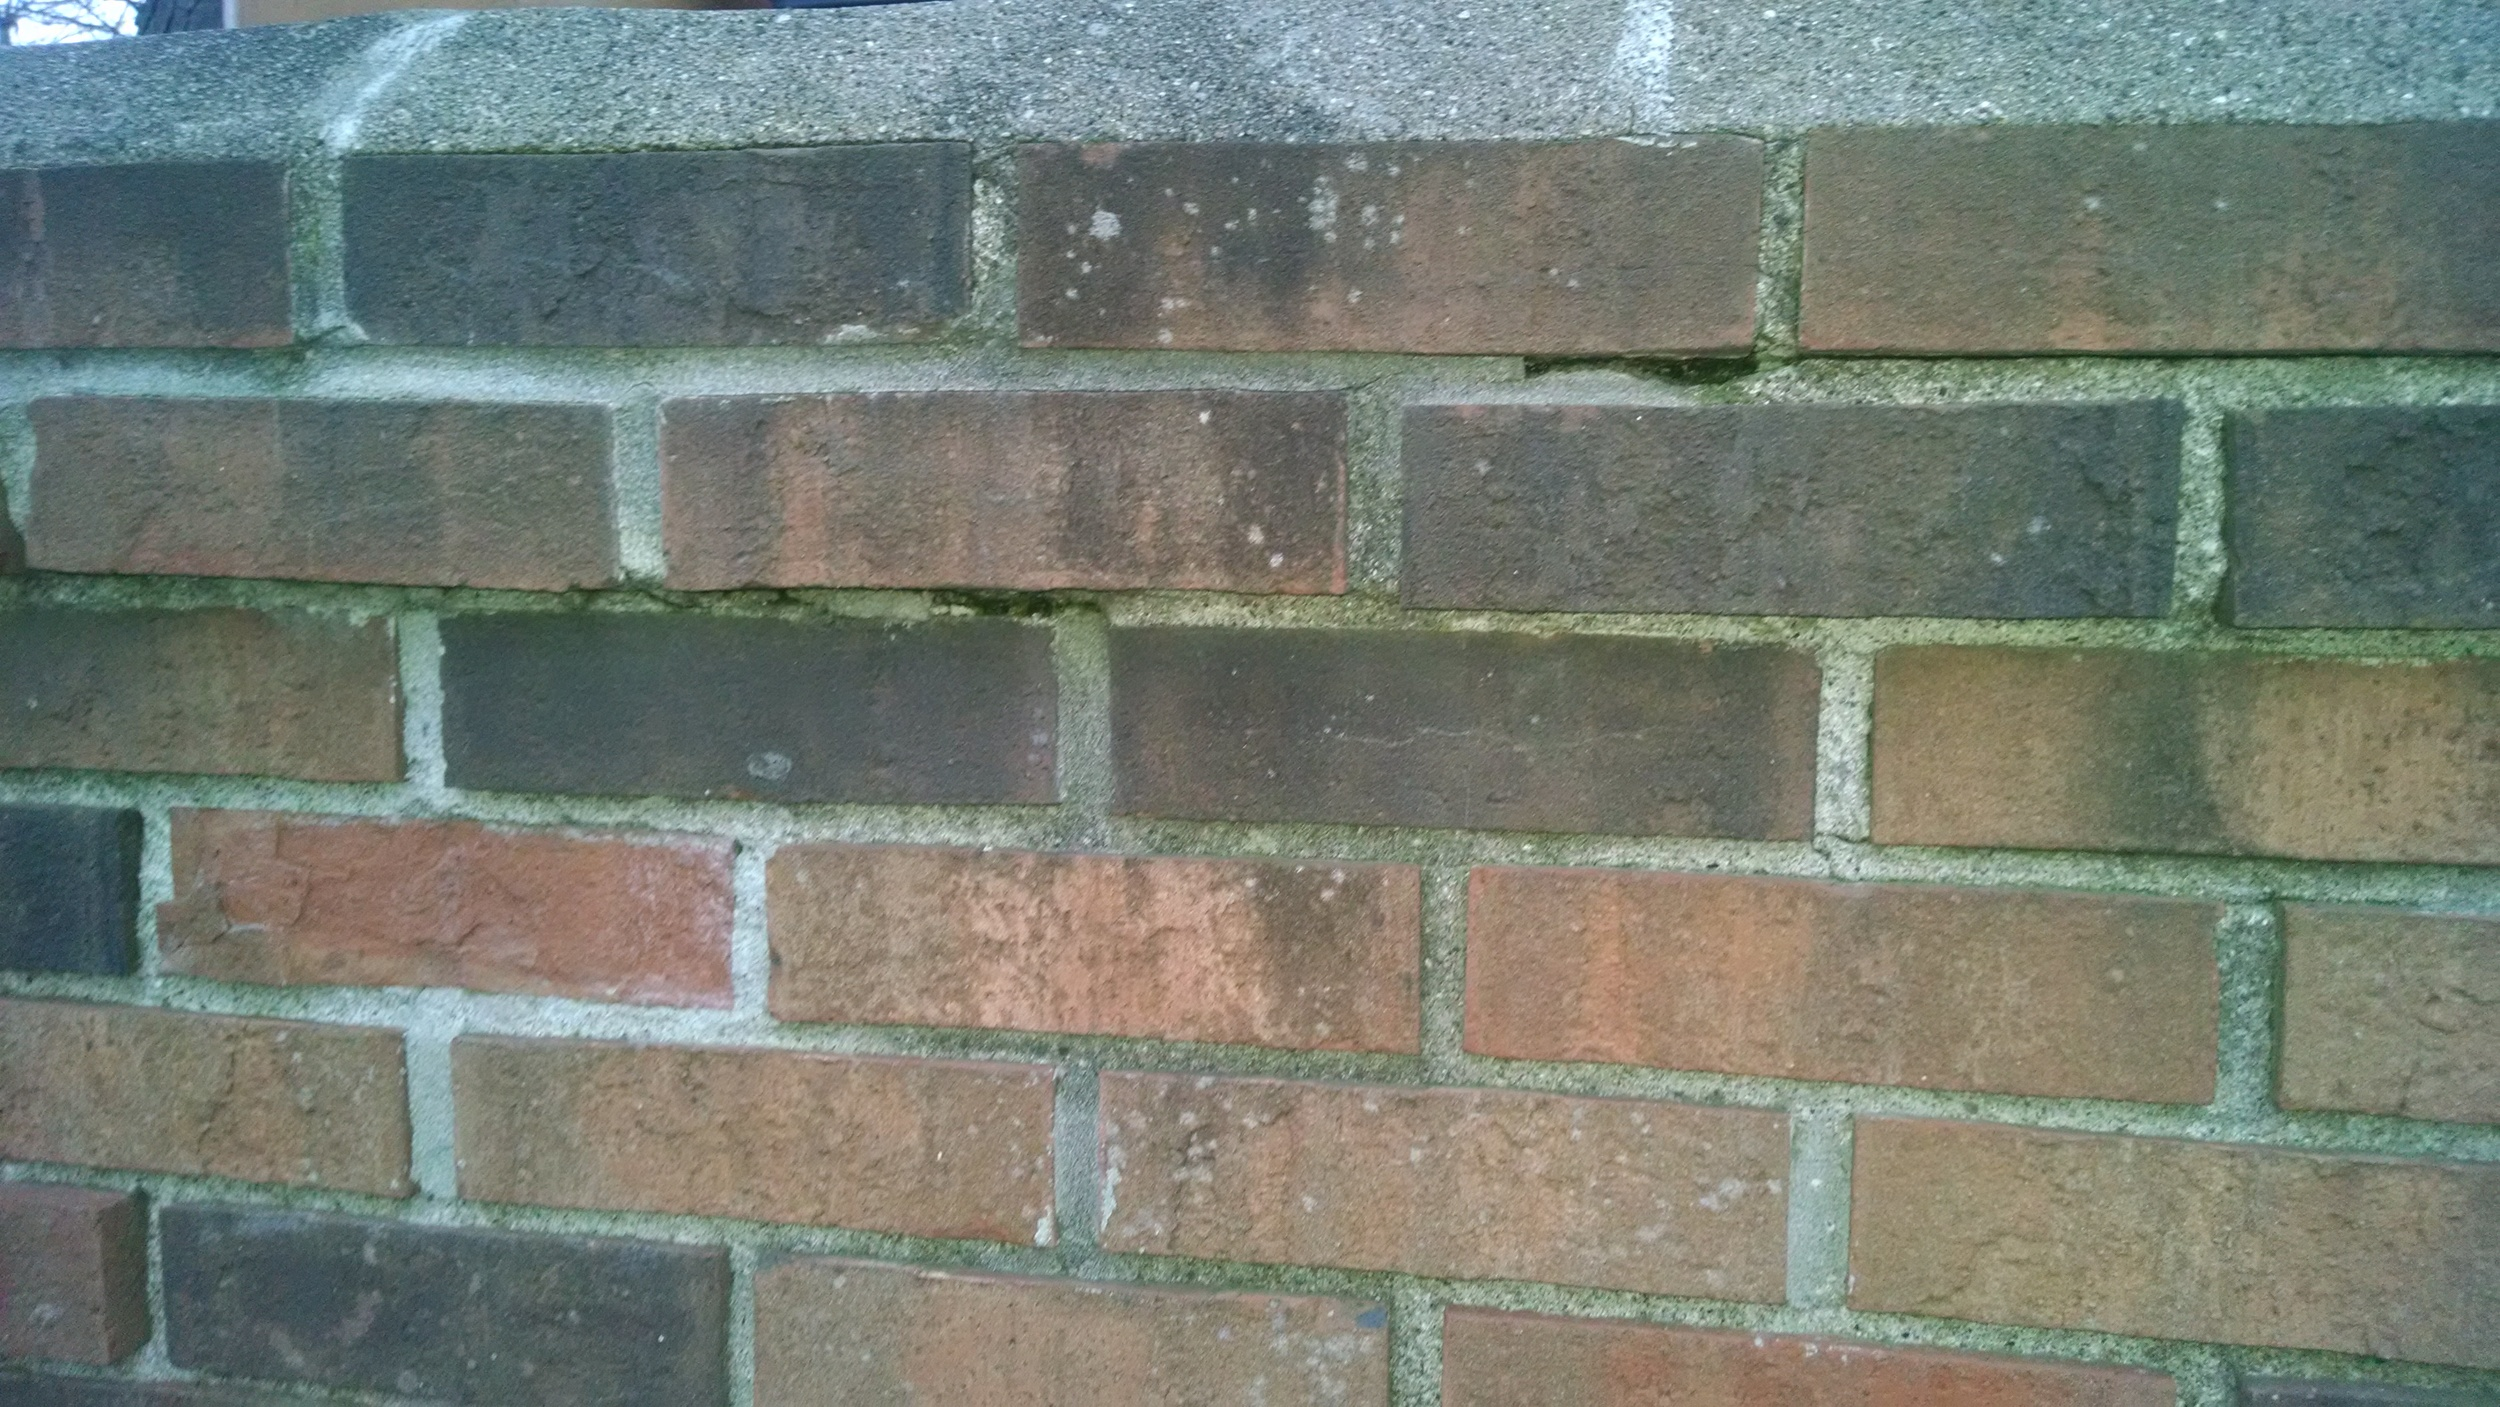 Cracks in mortar between chimney brick